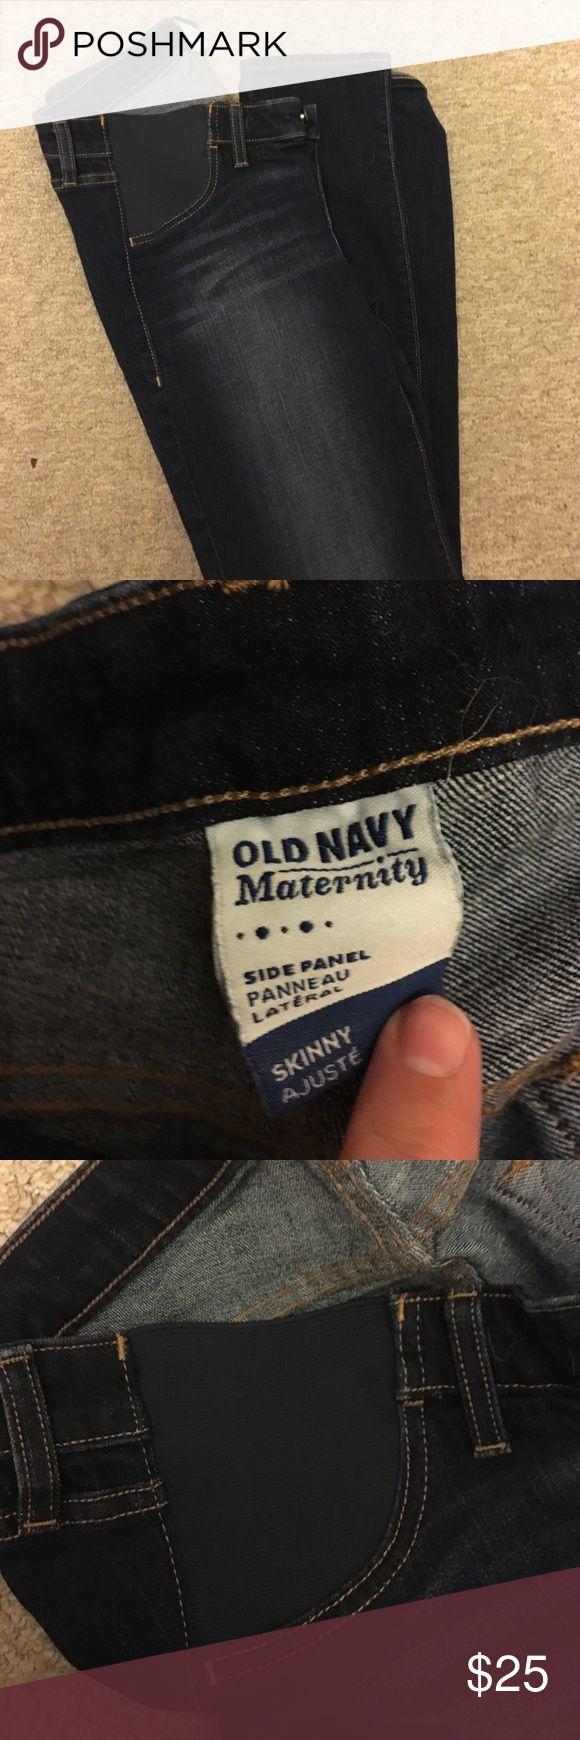 NWOT Old Navy Maternity Skinny jeans Side panel maternity jeans. Skinny dark wash Old Navy Jeans Skinny